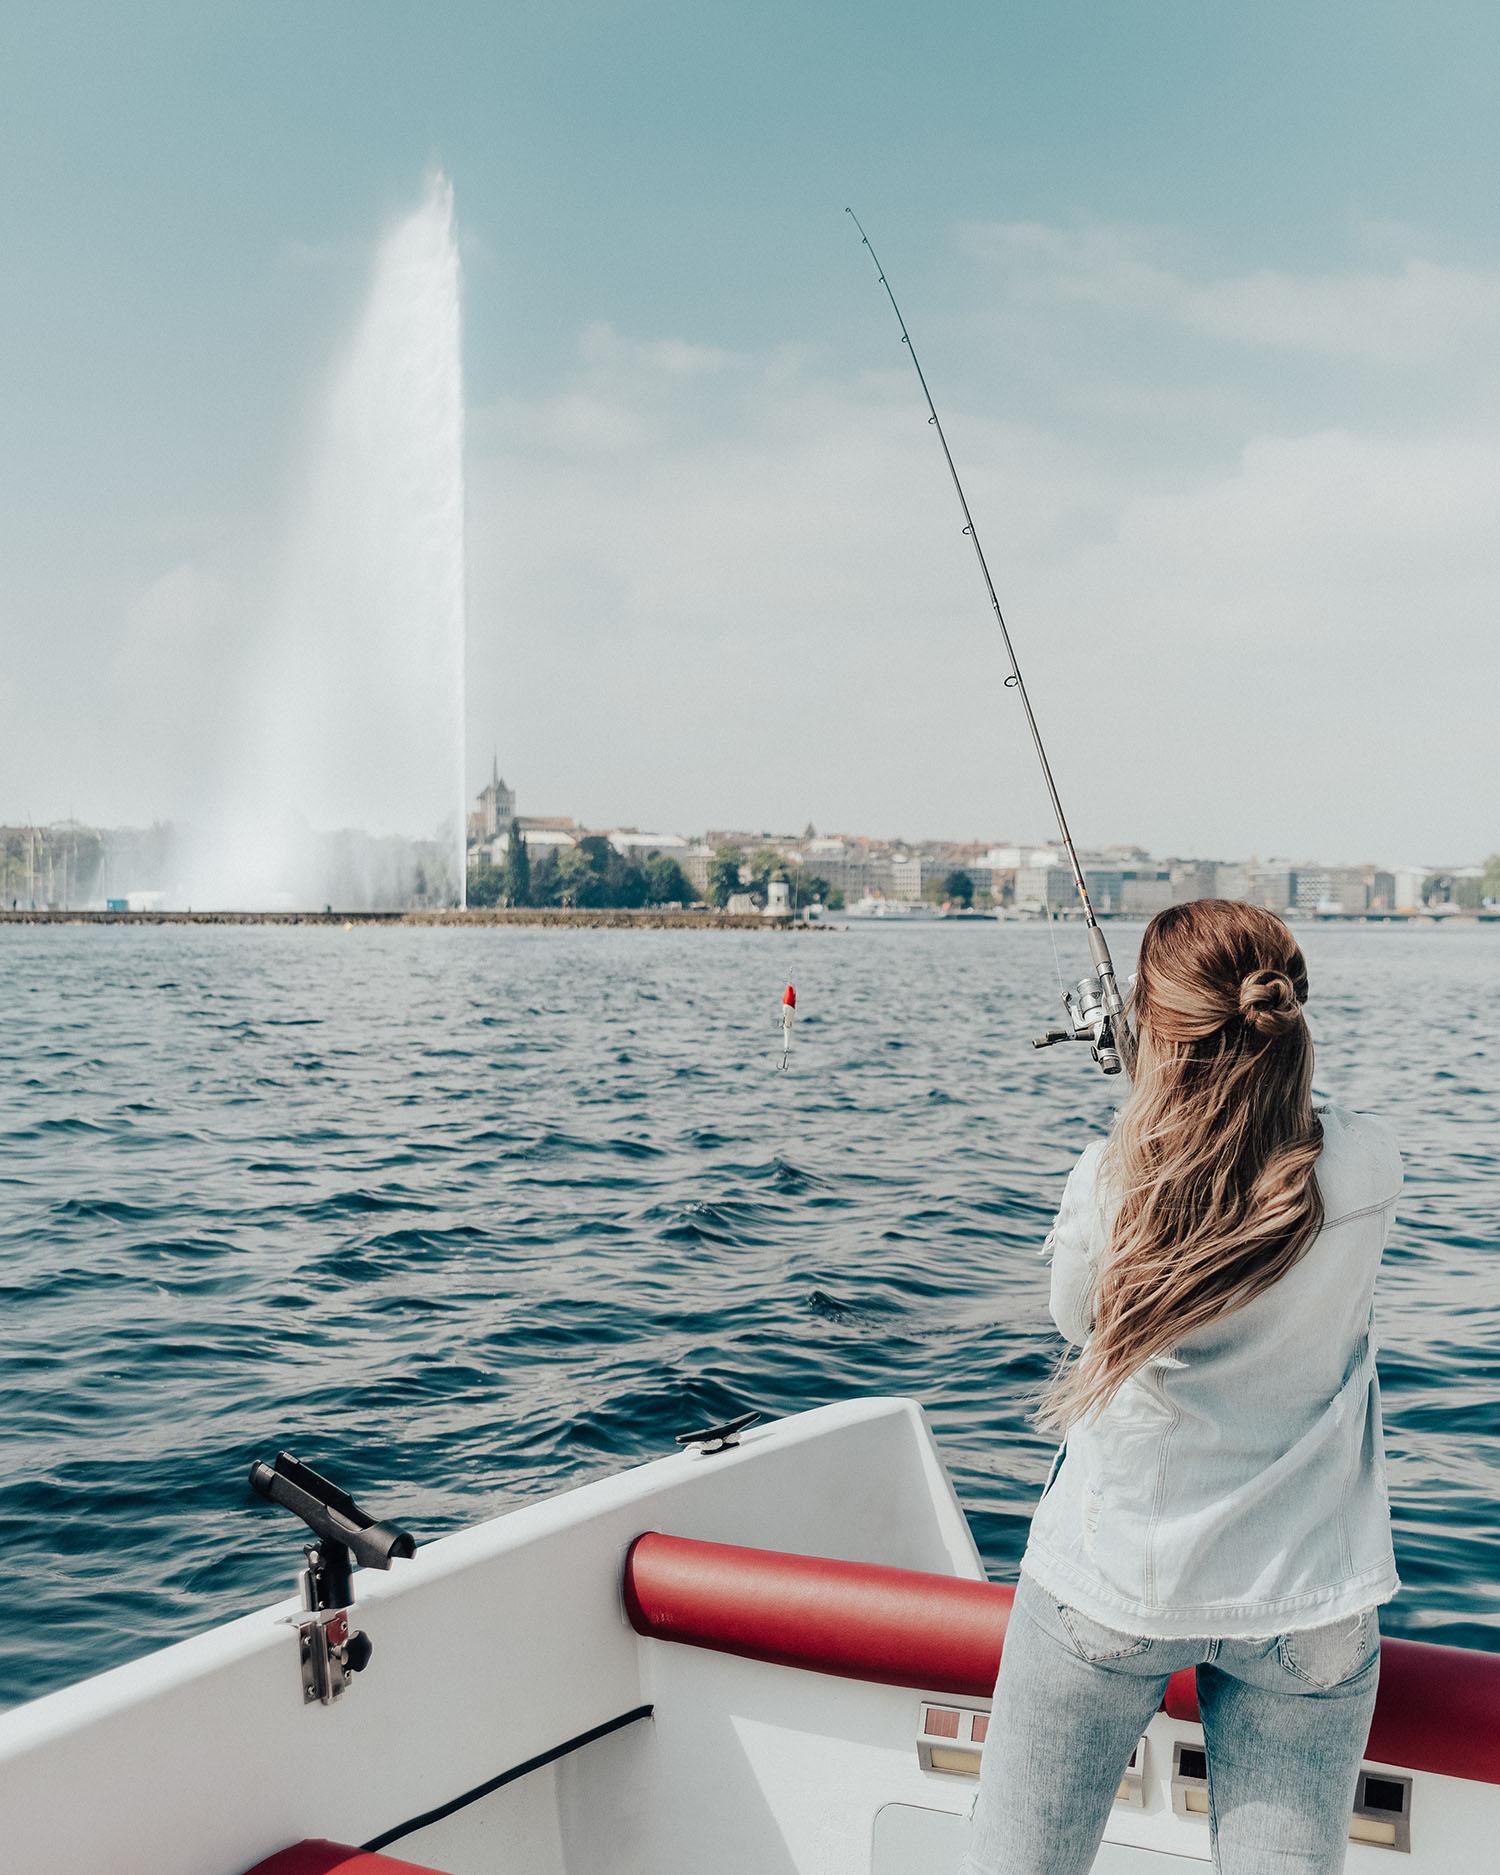 Adaras on a fishing boat trip on Lake Geneva - Jet d'eau in the background